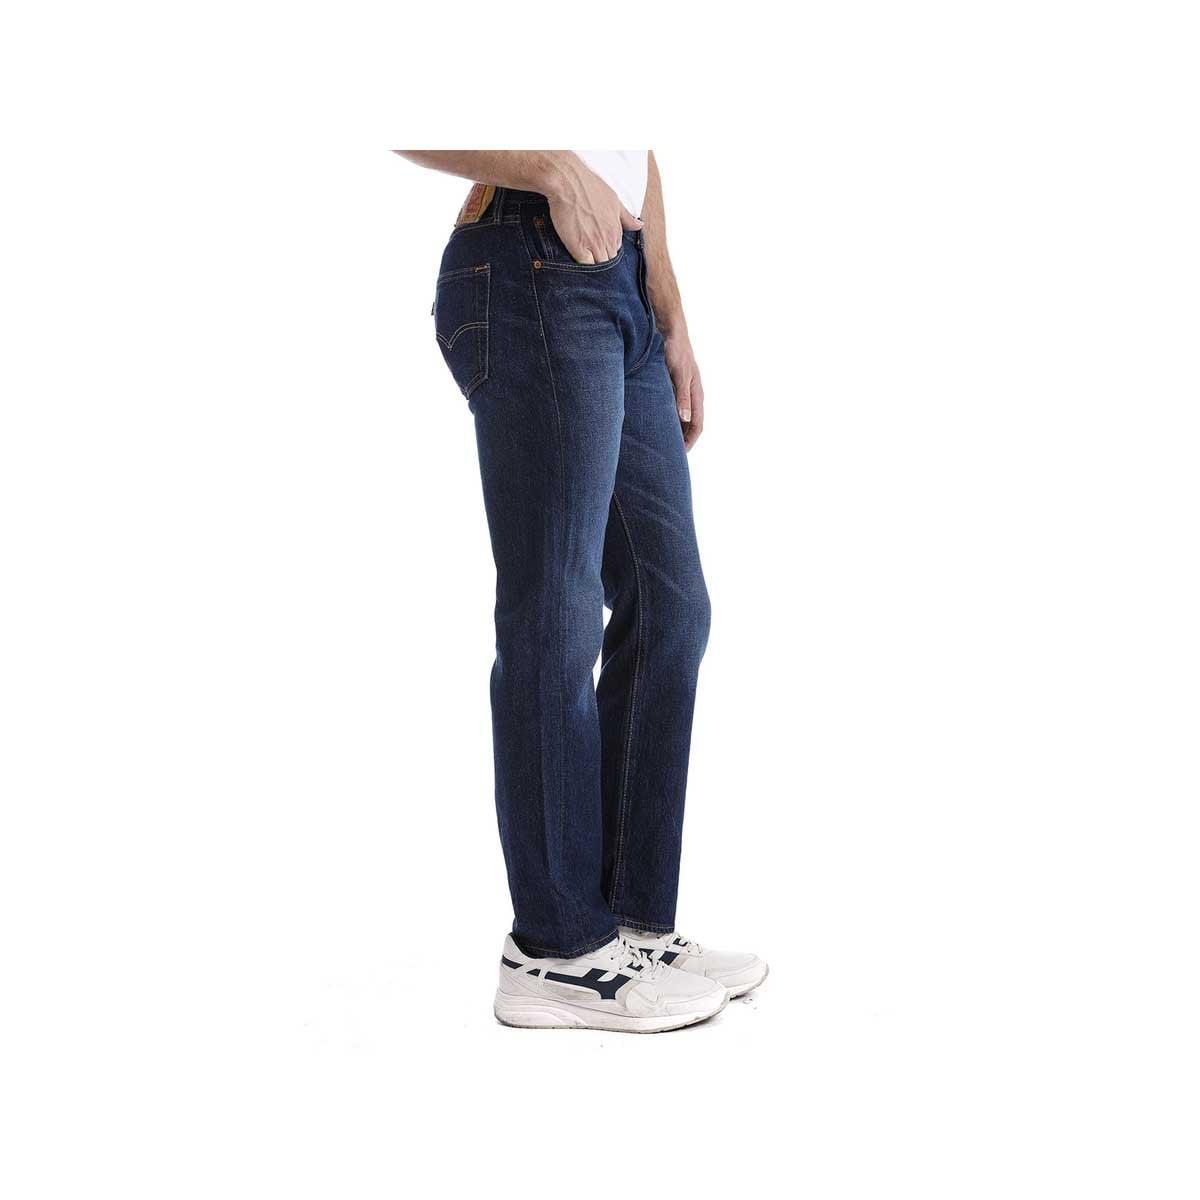 Jeans Original Fit Azul para Caballero Levi's® 501®